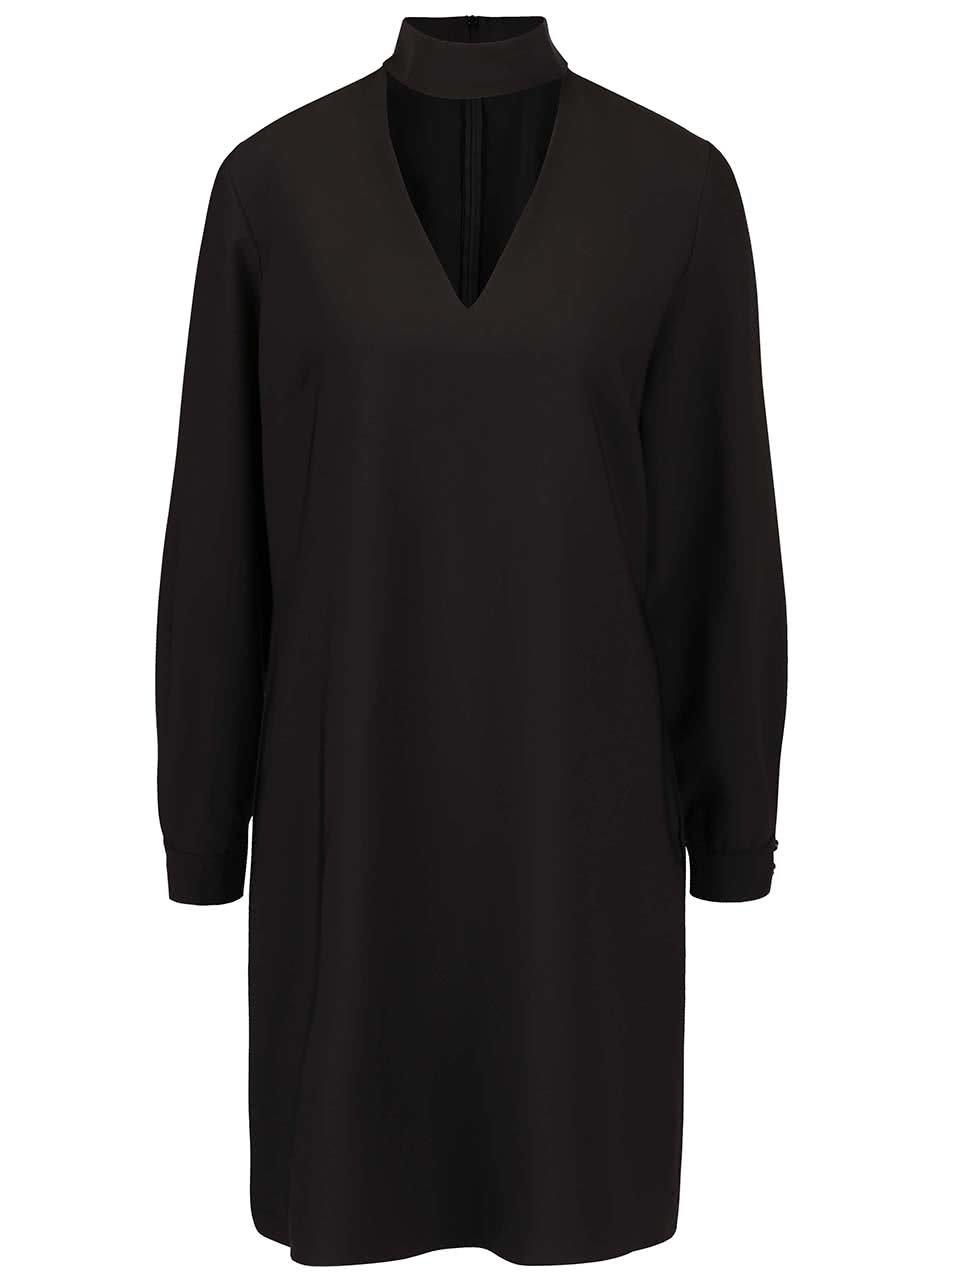 Čierne šaty so stojatým golierom Closet ... b786547f28b